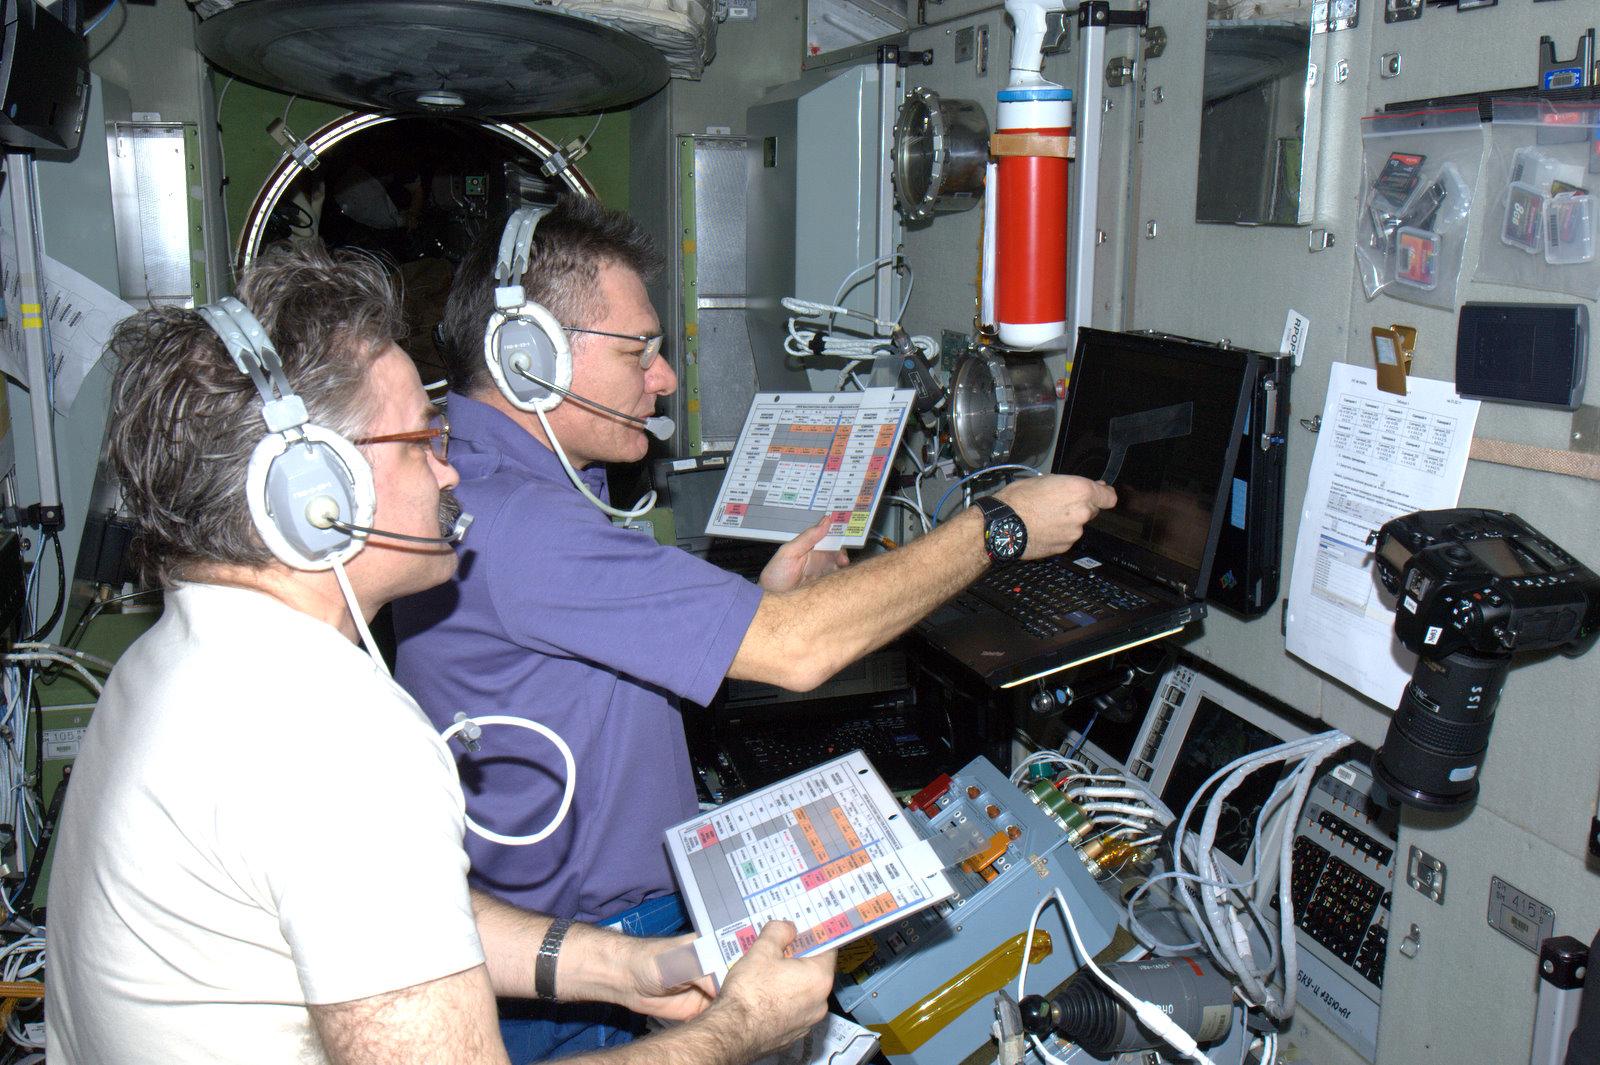 astronauts sleeping compartment - photo #17